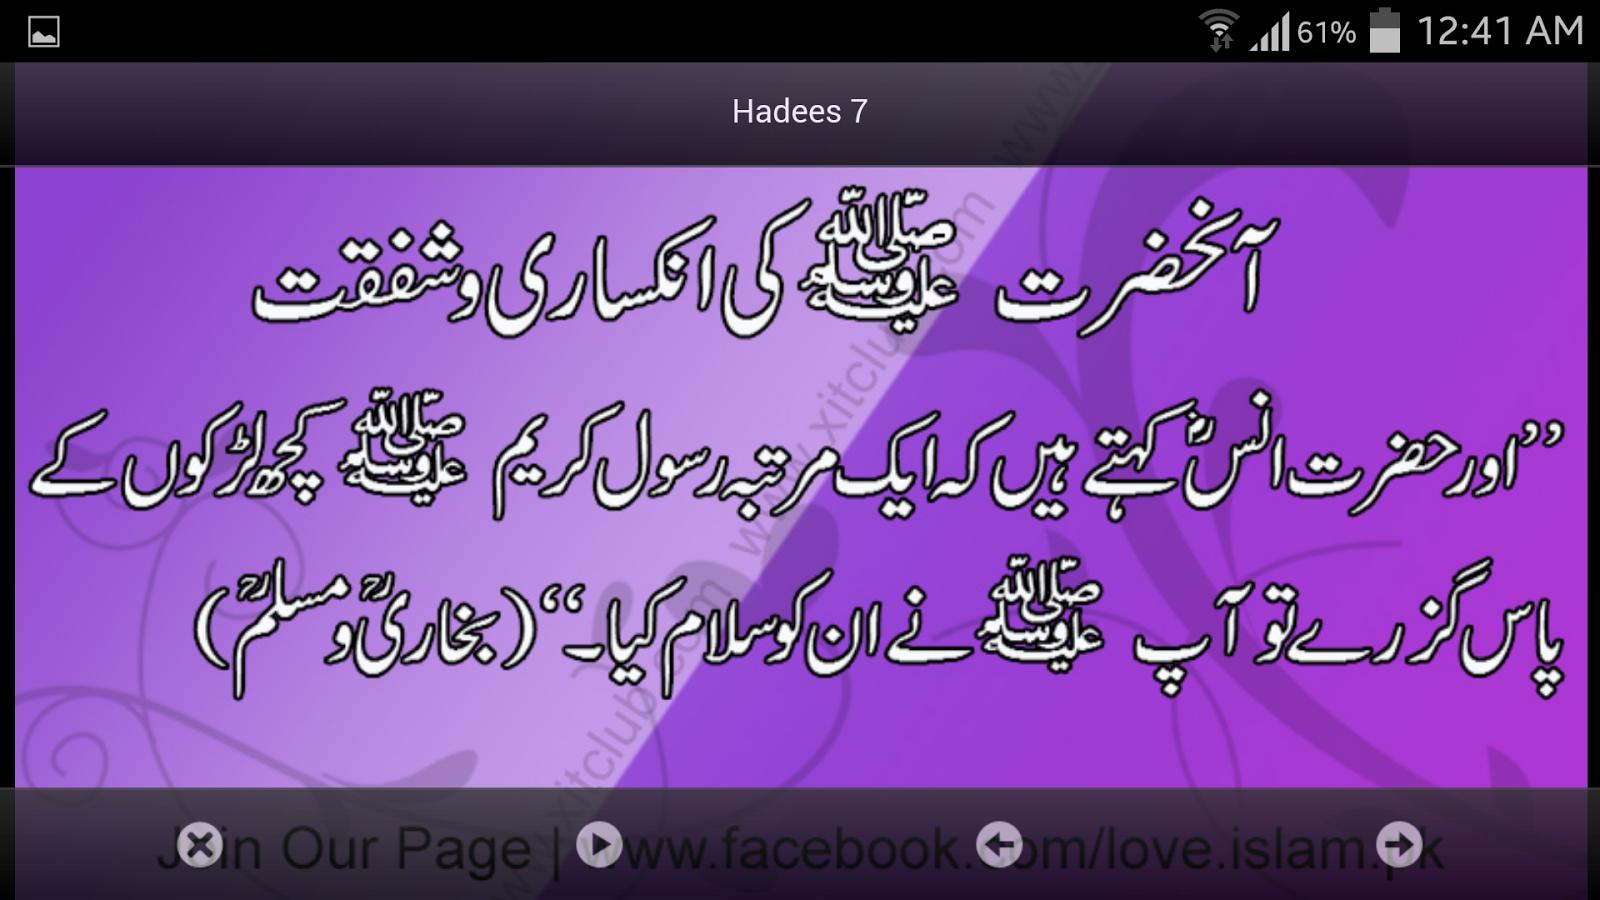 hadees e nabvi screenshot ahades 7 hadees free